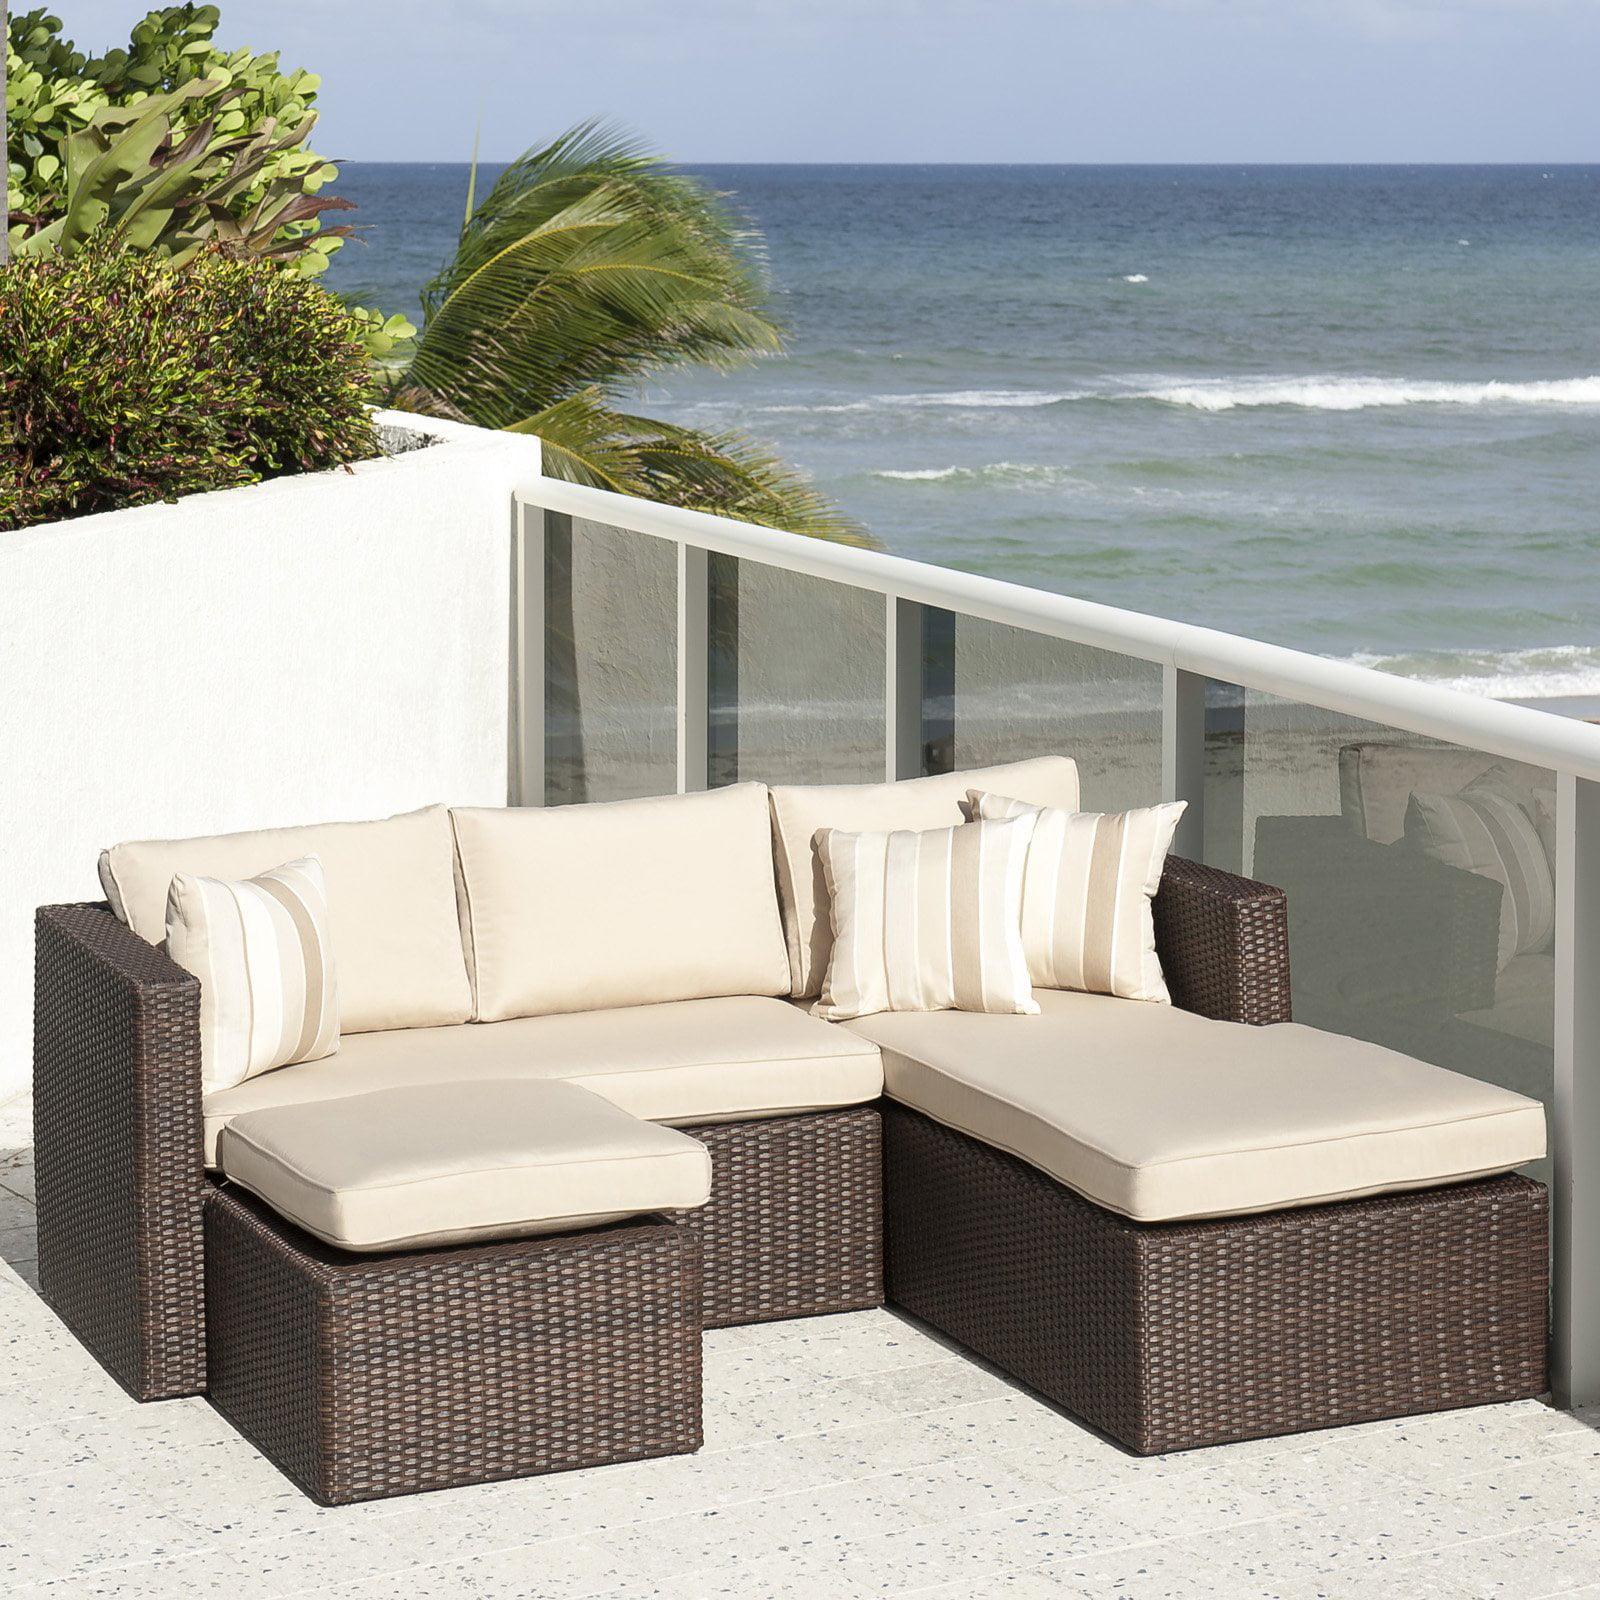 Atlantic sydney 3 piece patio conversation set with sunbrella cushions